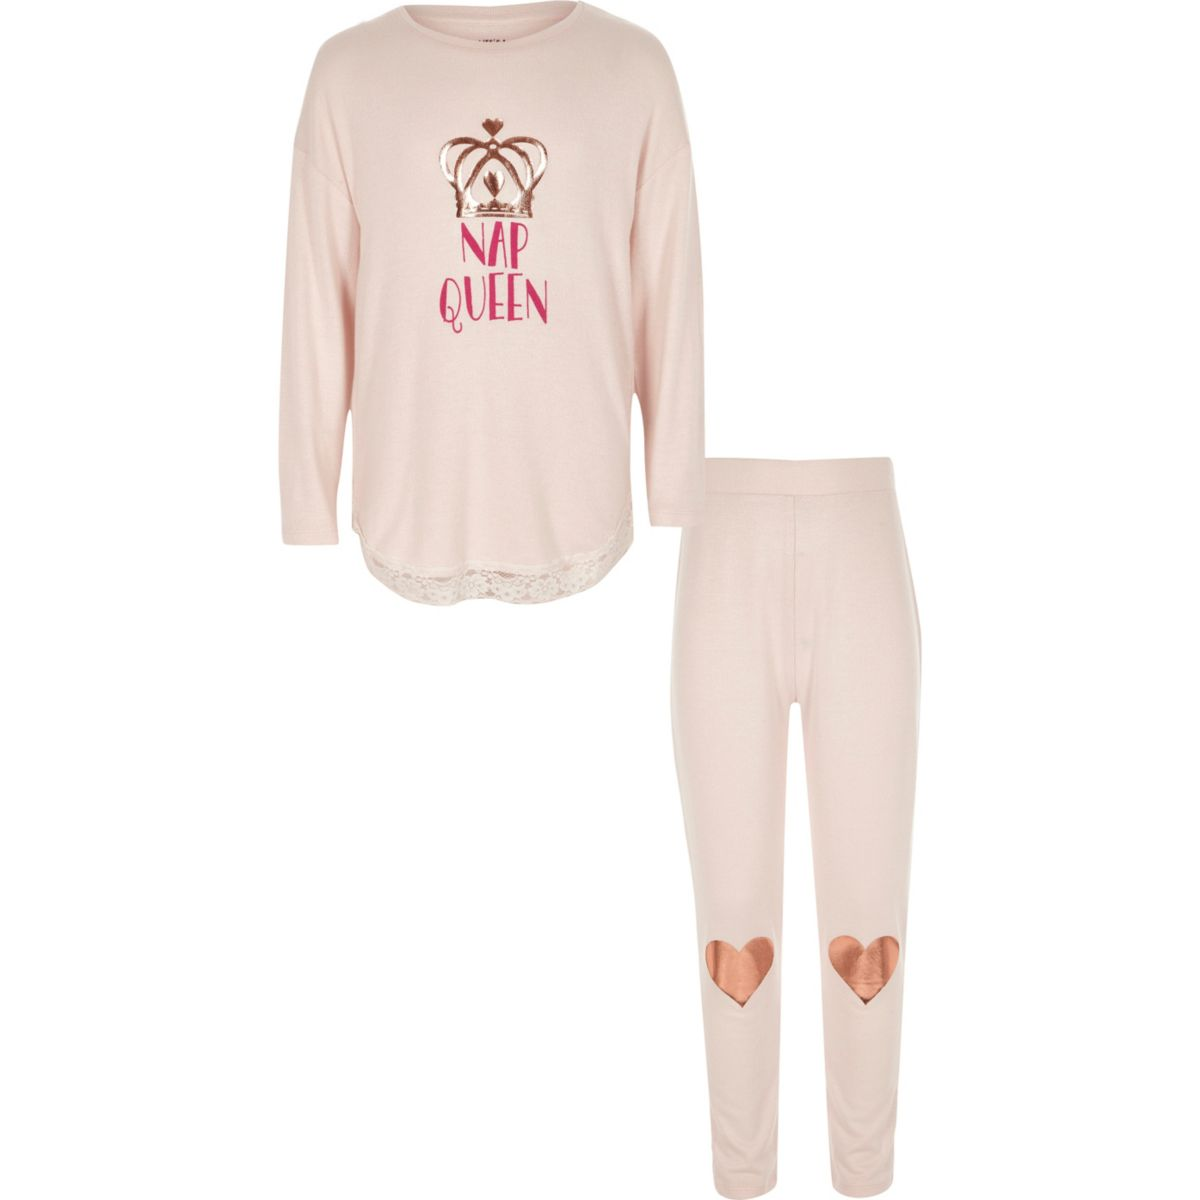 "Rosa Pyjama mit ""Nap queen""-Print"